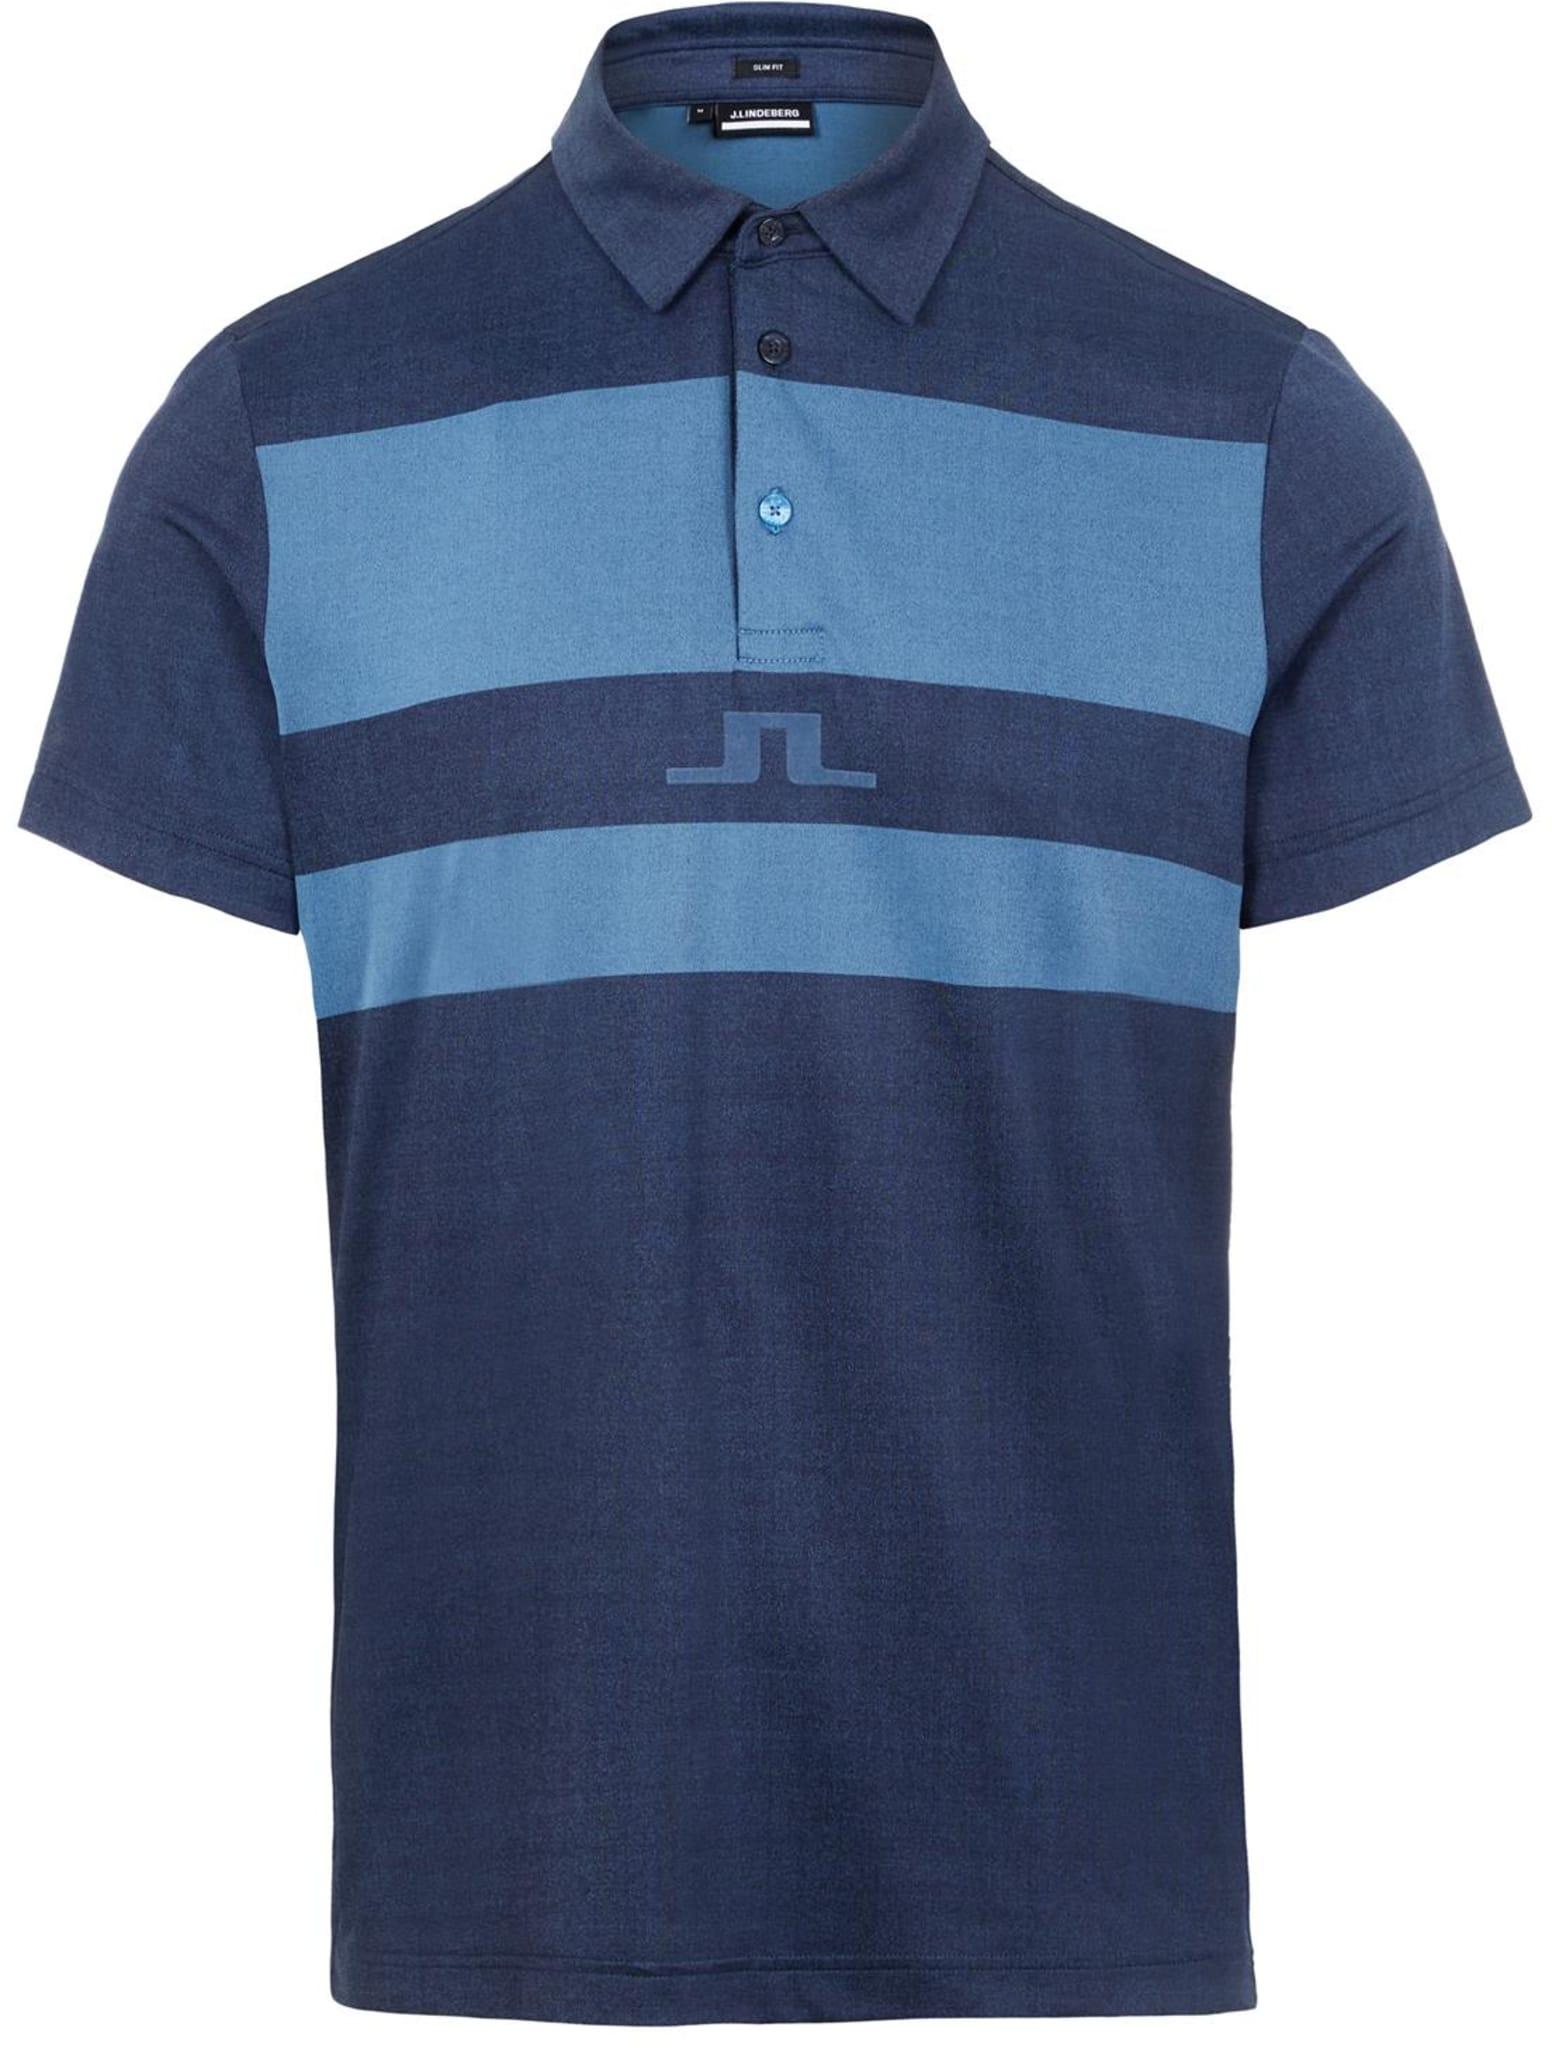 Kyle Golf Poloshirt M